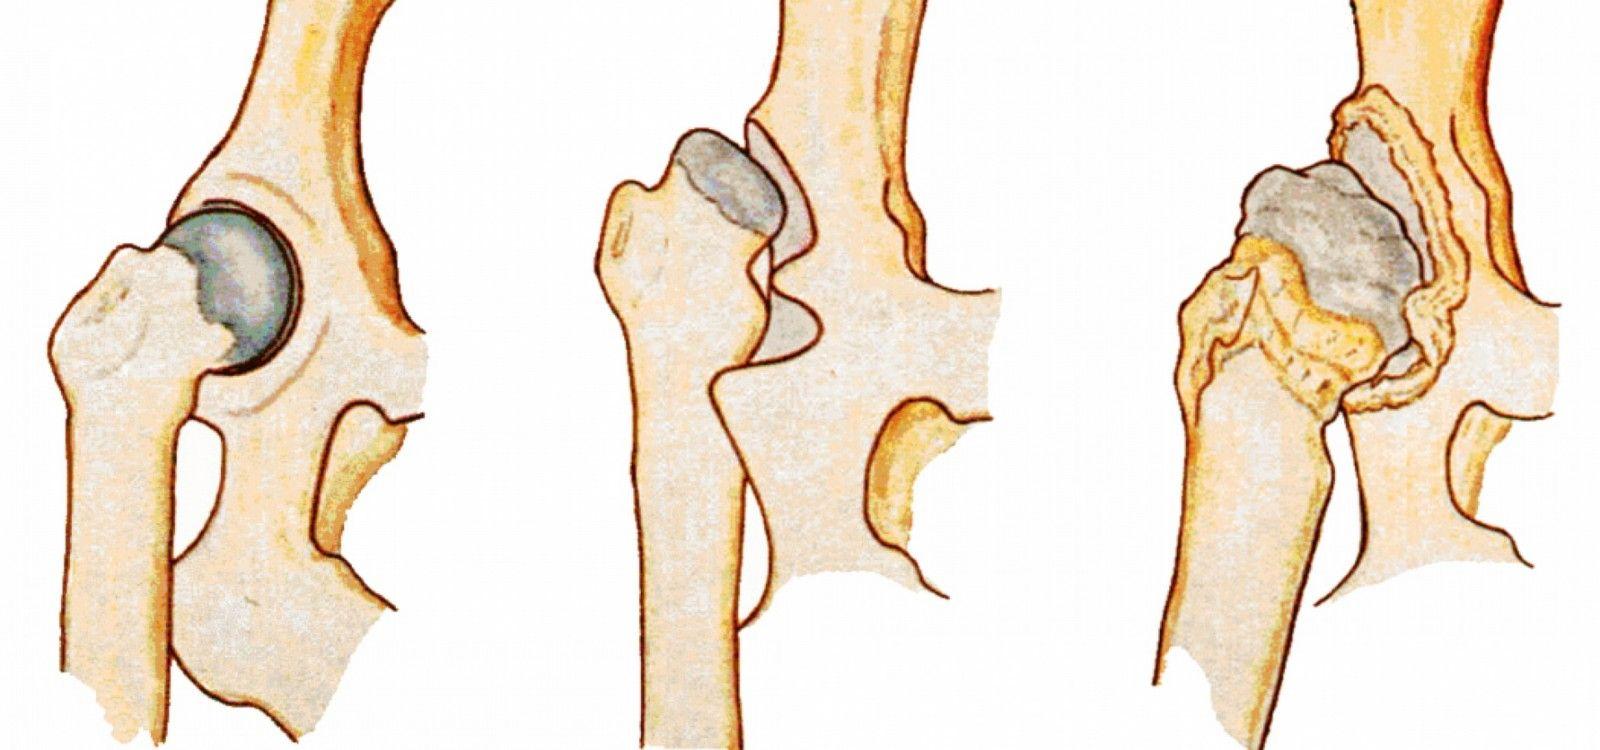 Что такое дисплазия тазобедренного сустава у ребенка 4 месяца thumbnail